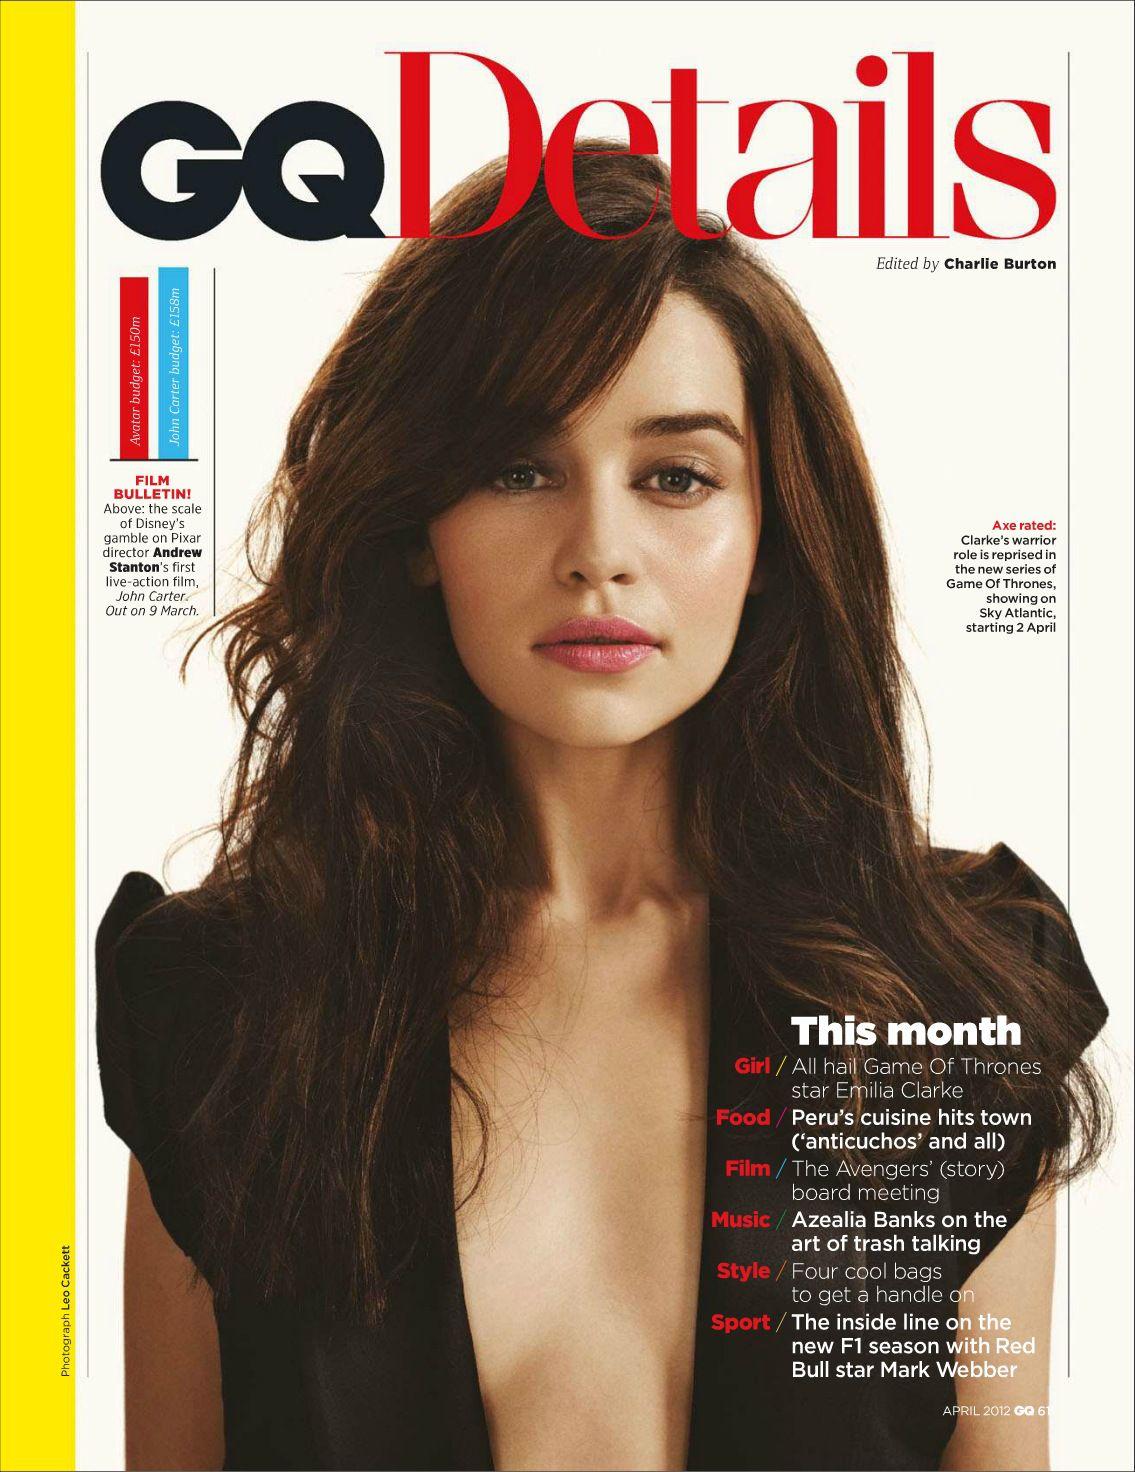 Emilia Clarke Gq Magazine Game Of Thrones Photo 29513273 Fanpop